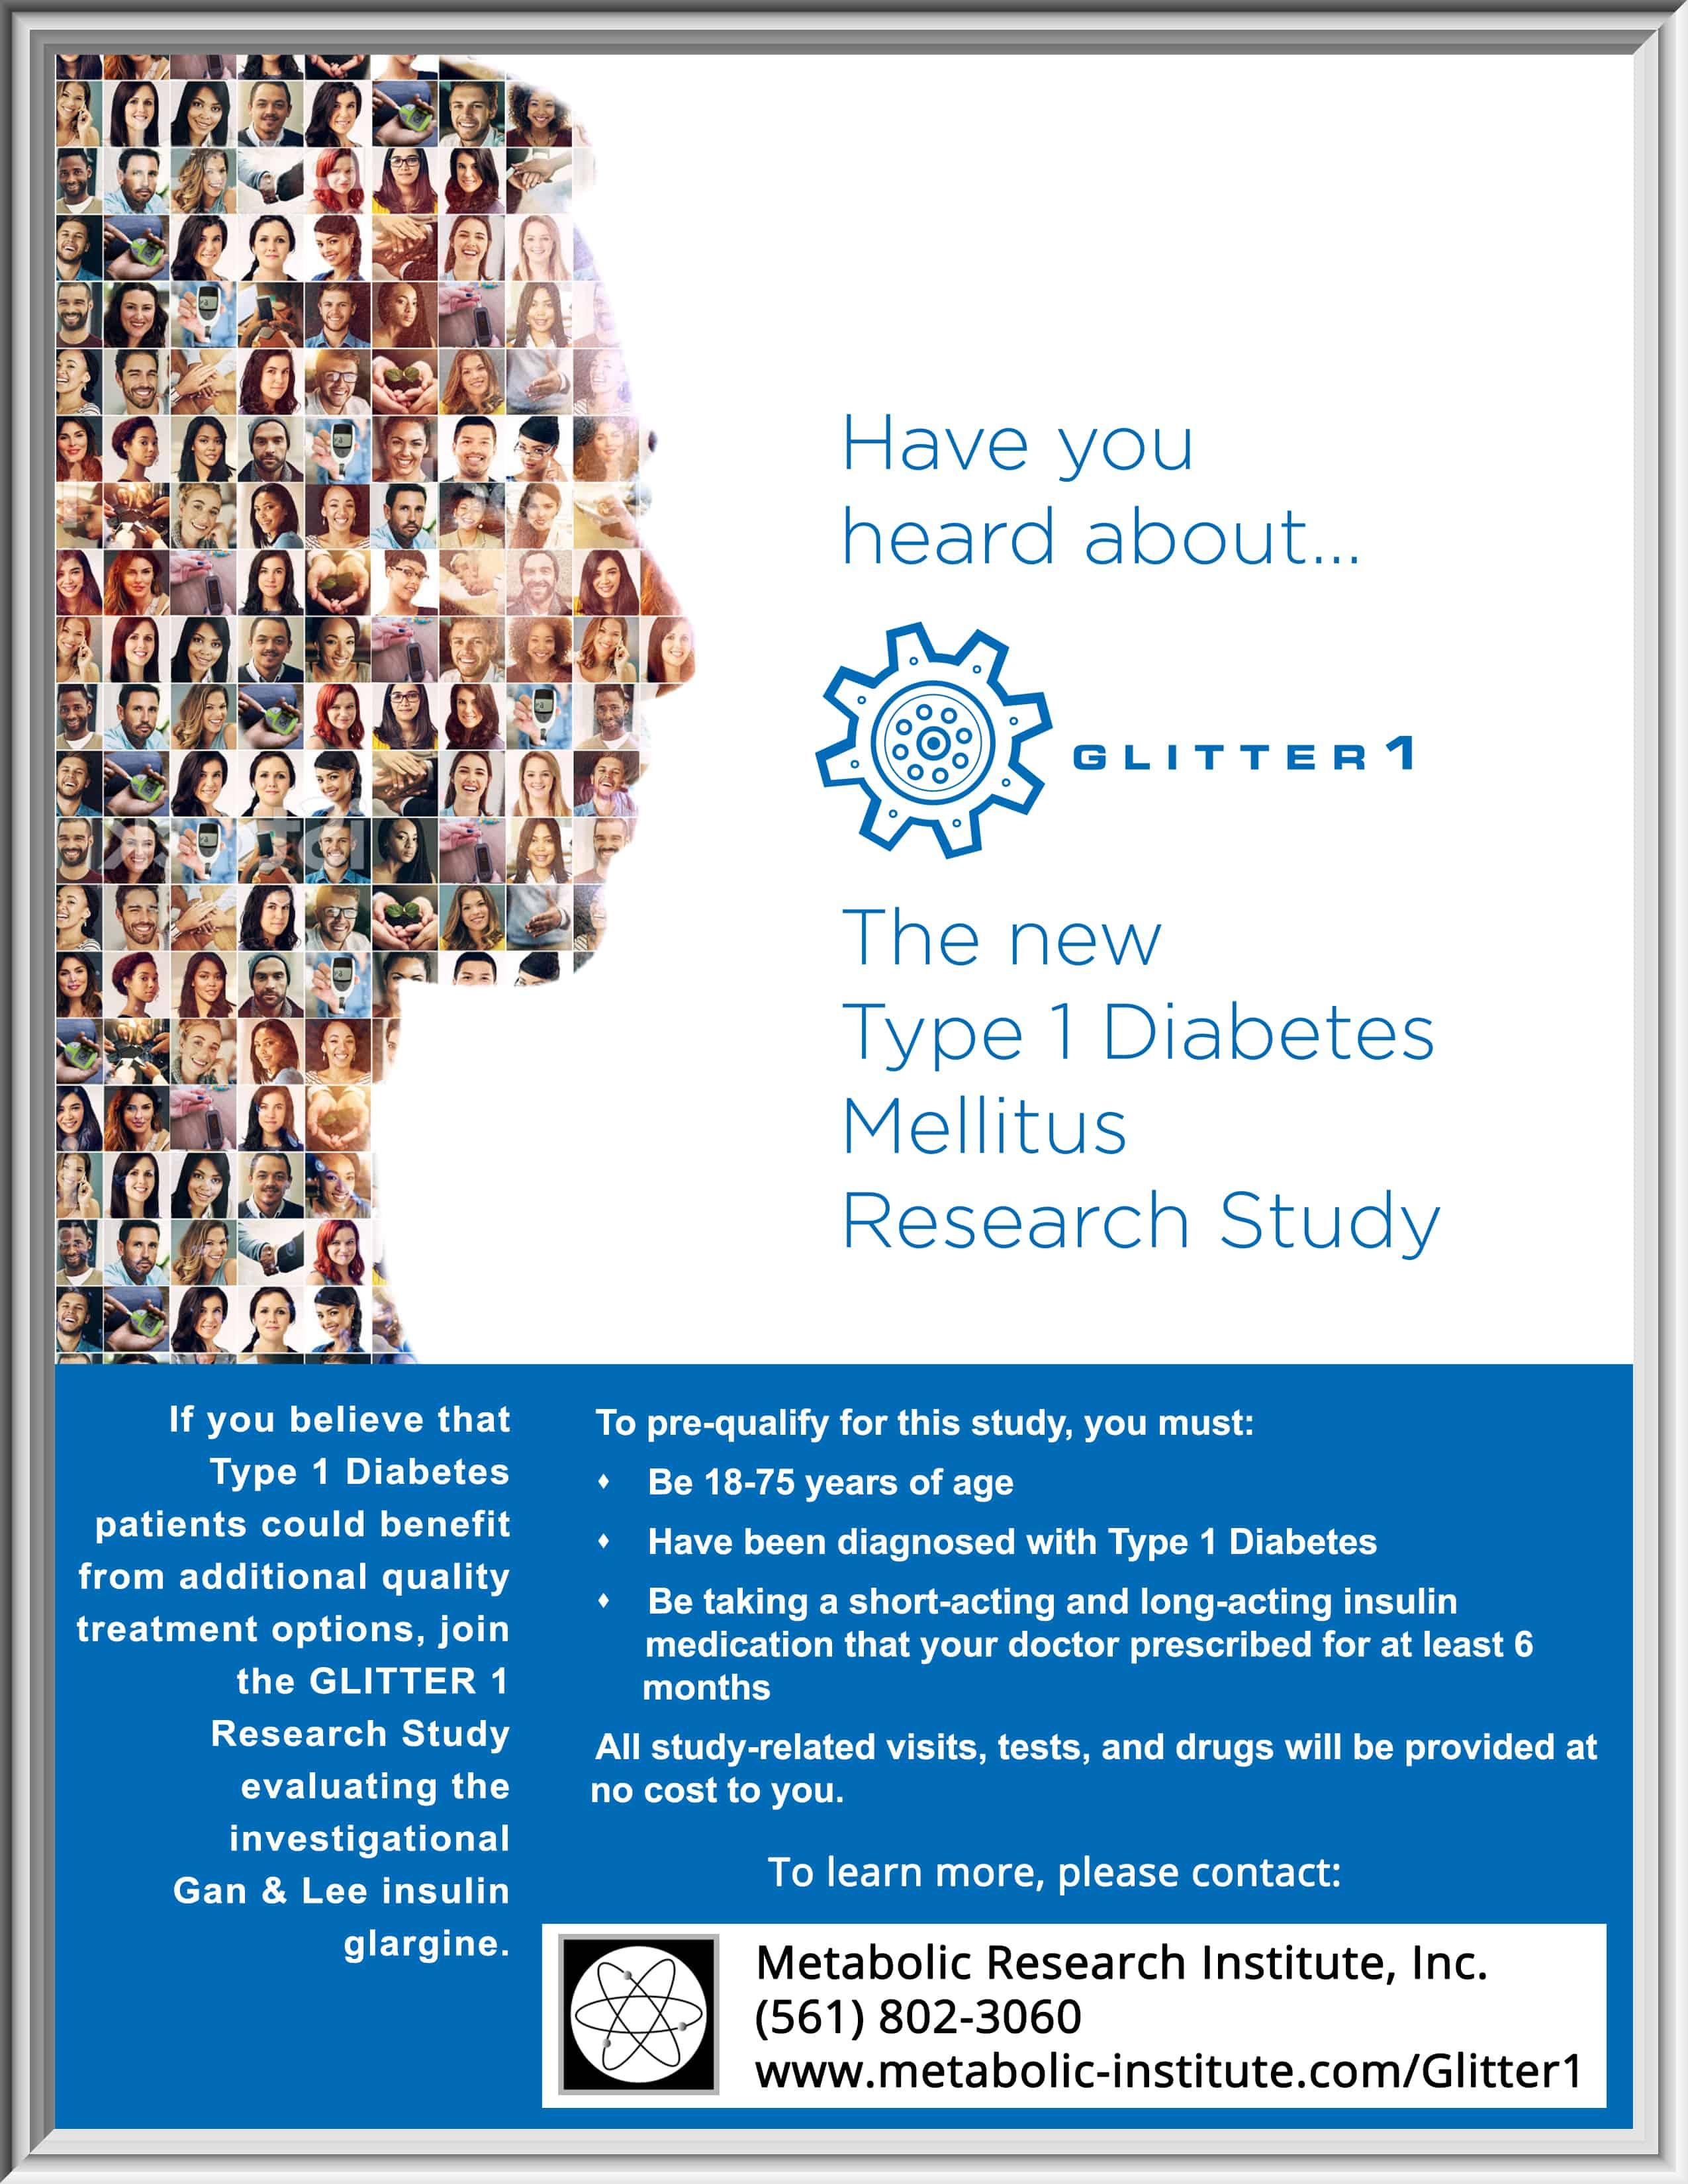 Glitter 1: Type 1 Diabetes Mellitus Research Study